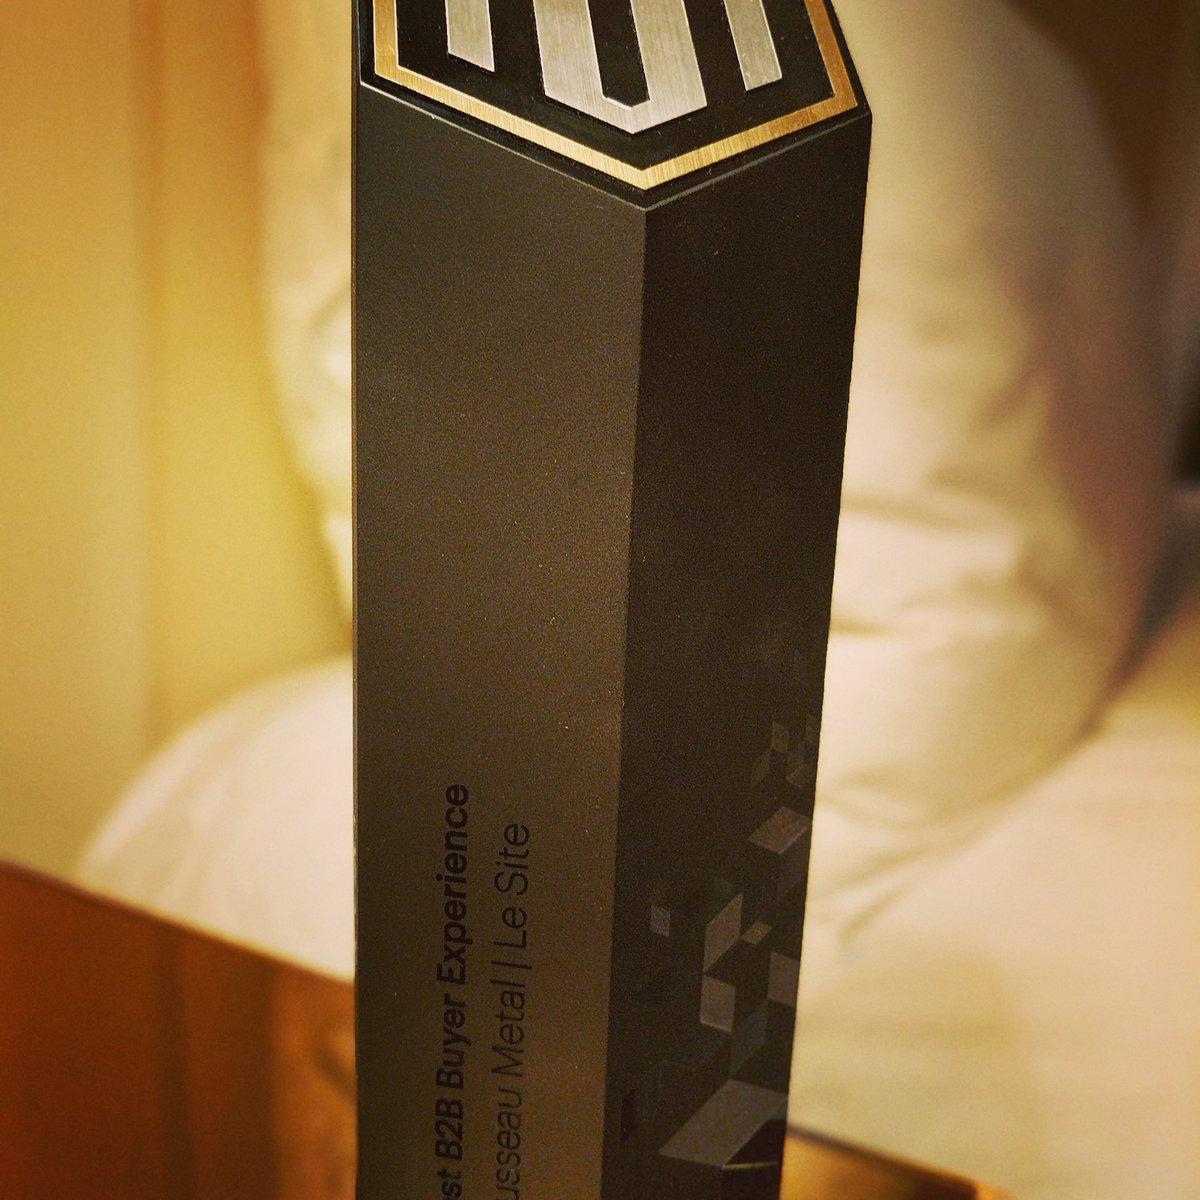 MBliah: Winning the best B2B award...It feels so gooood! #Magentoimagine https://t.co/FkXOk9MPtc